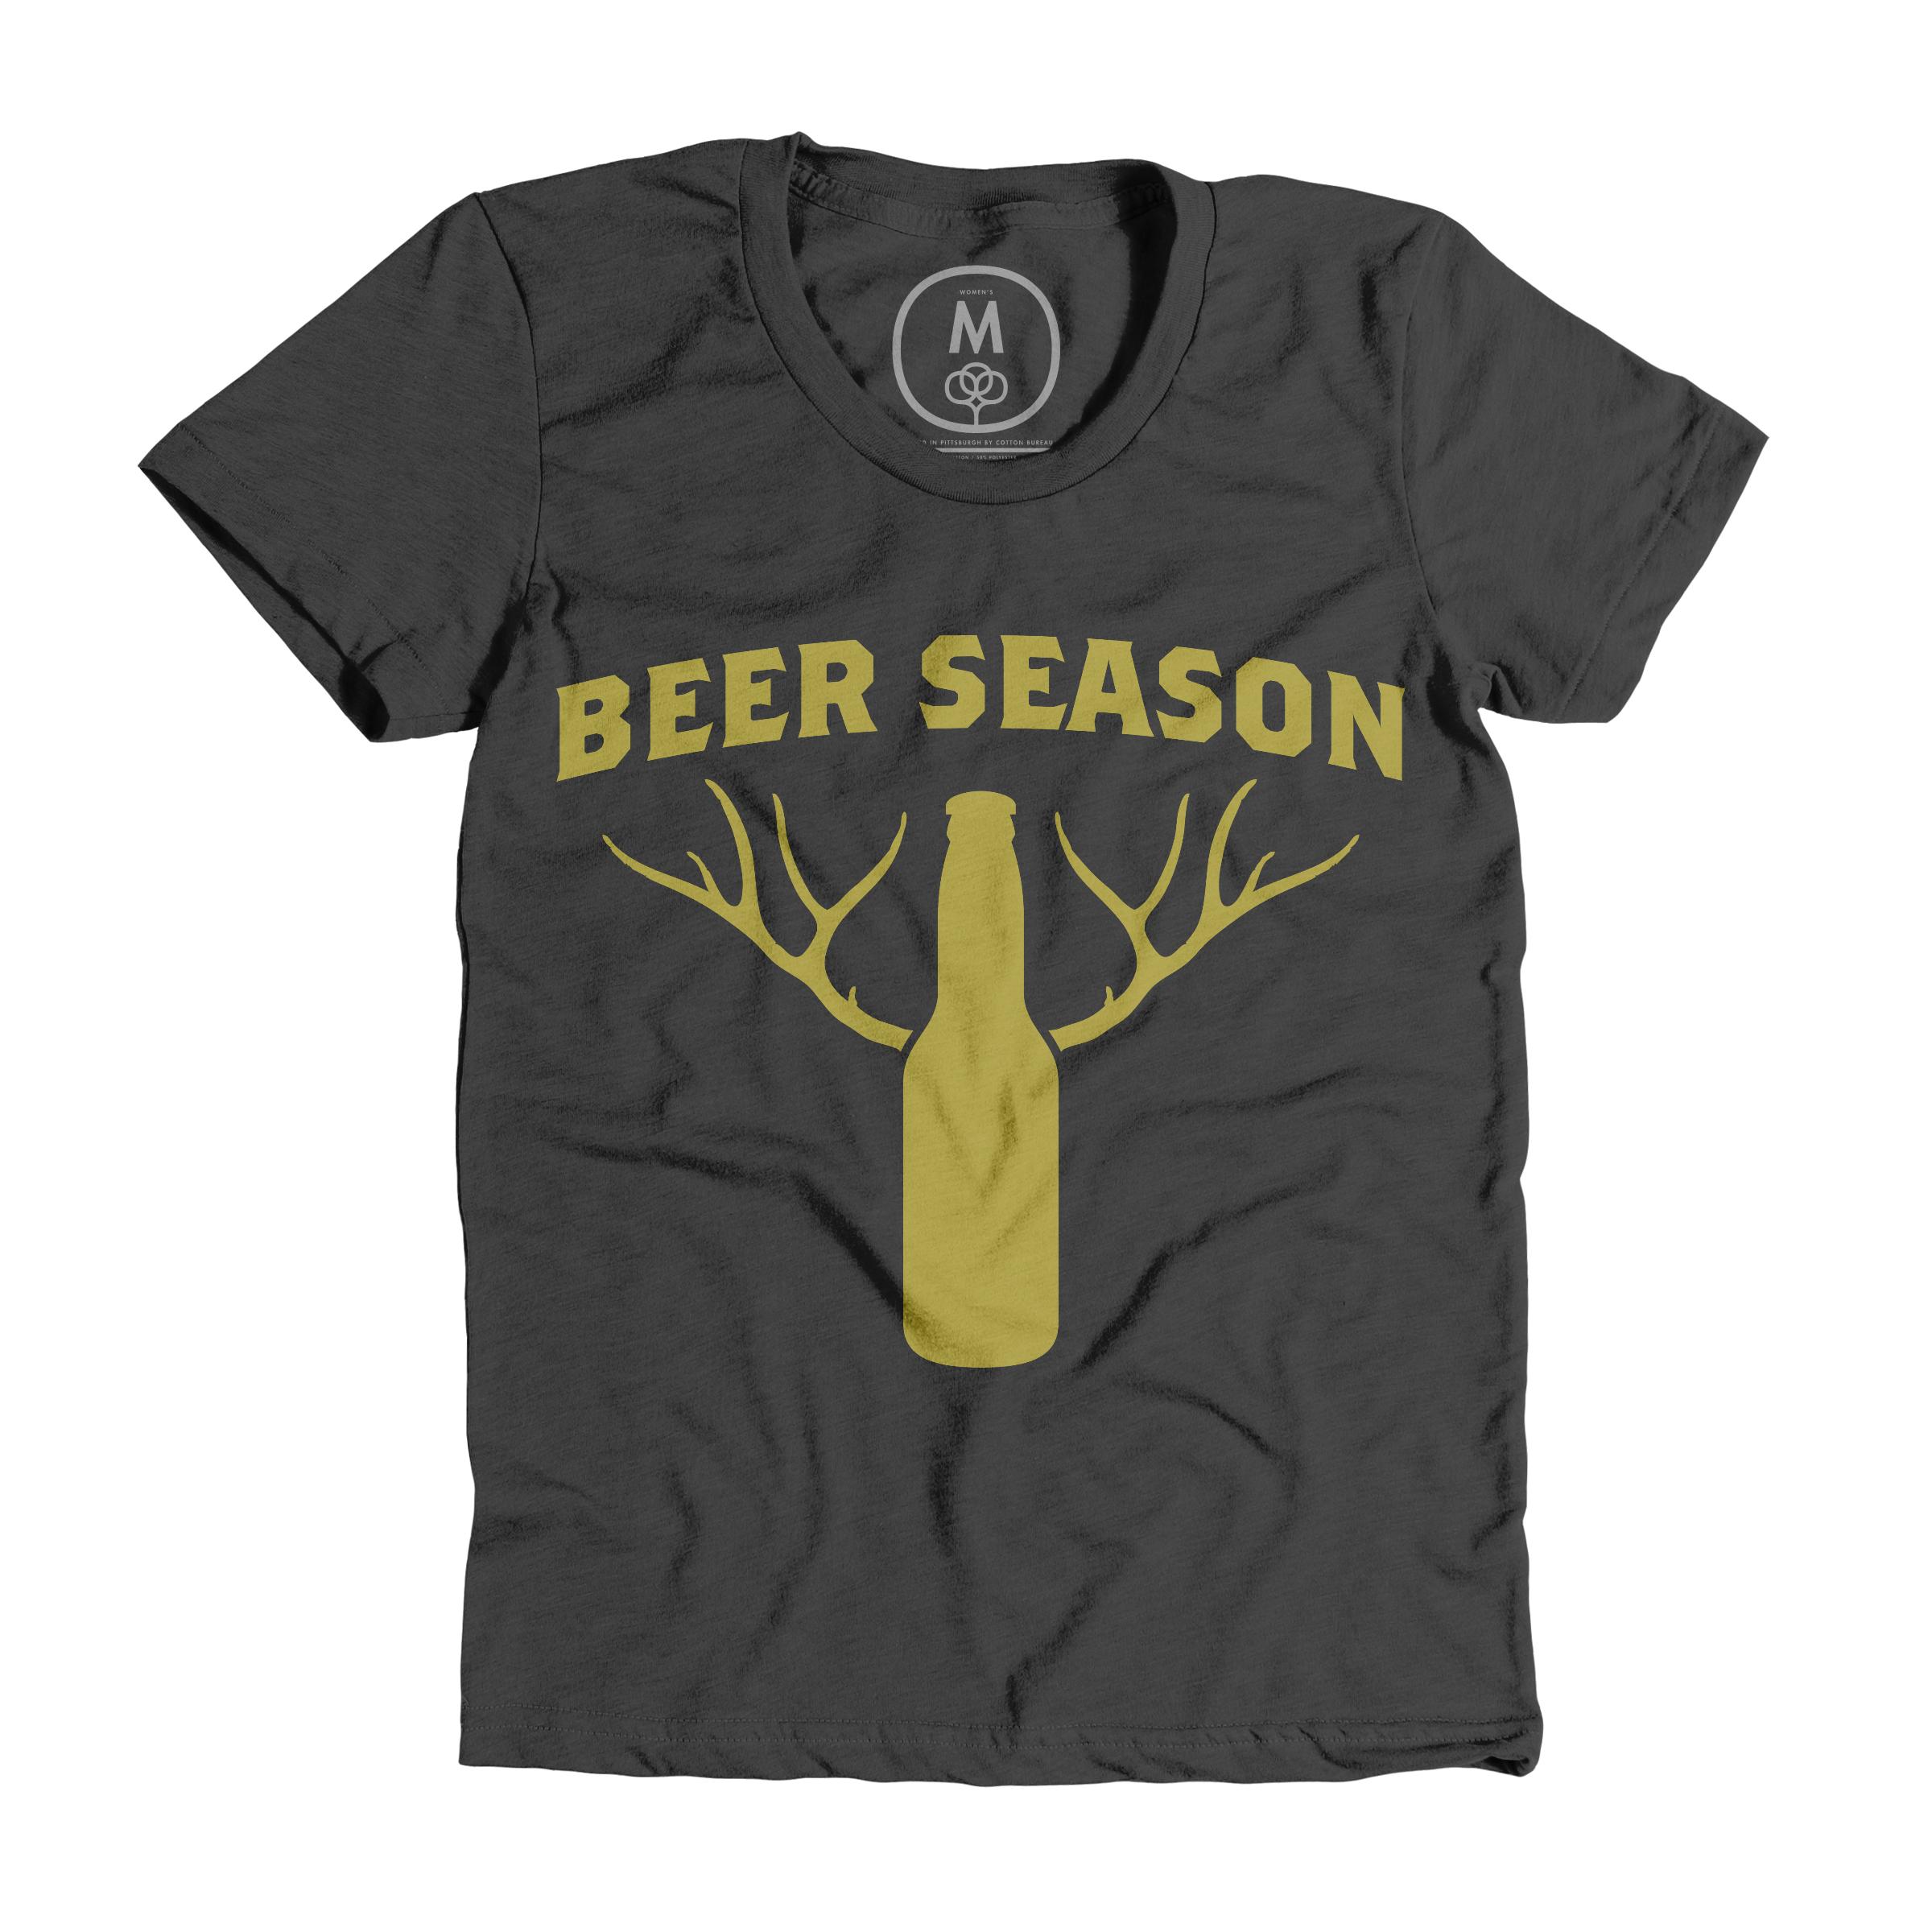 Beer Season Heather Black (Women's)